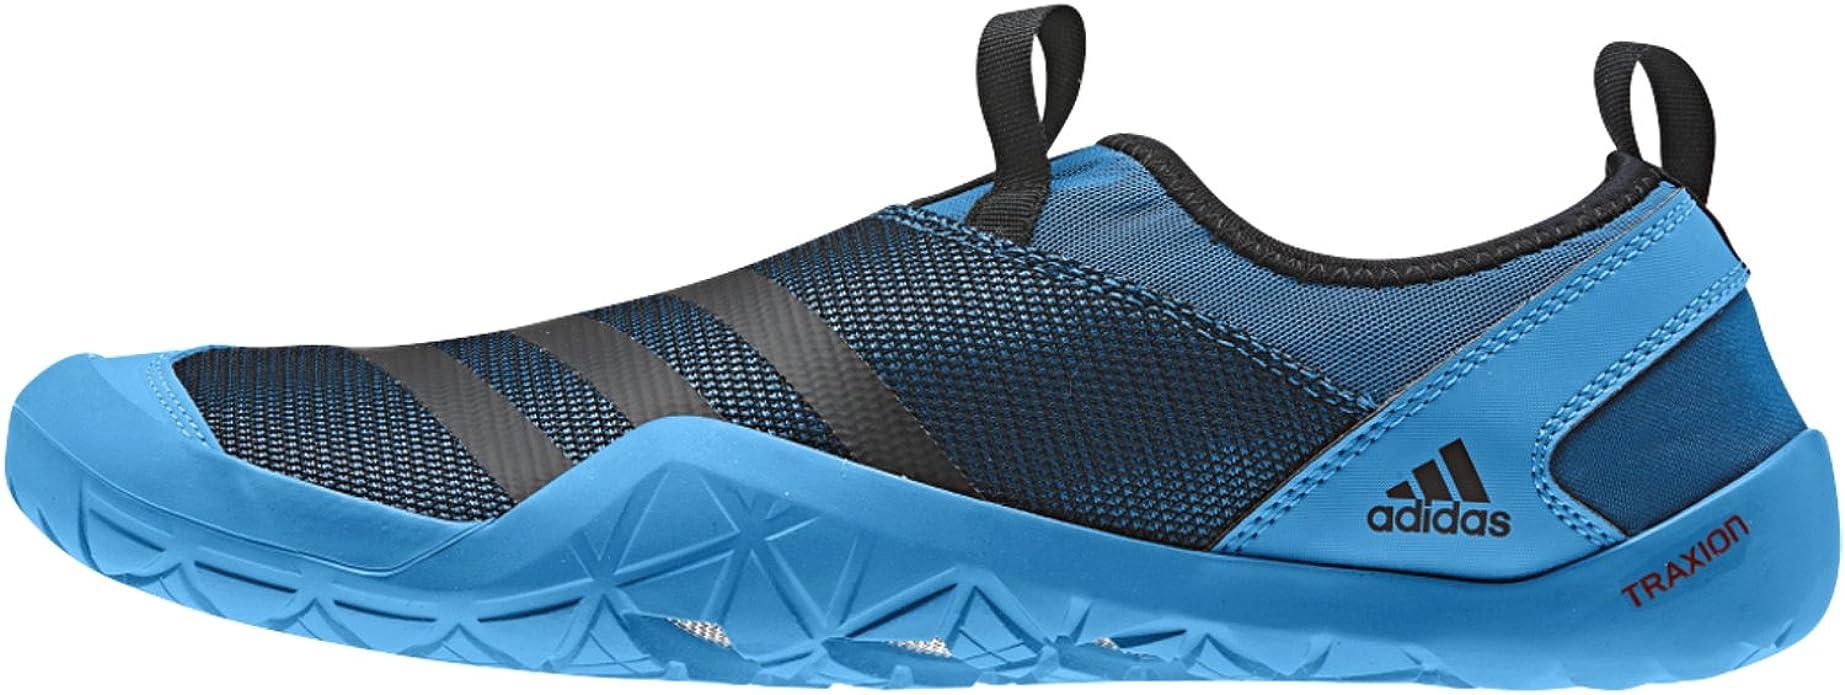 adidas outdoor Climacool Jawpaw Slip On